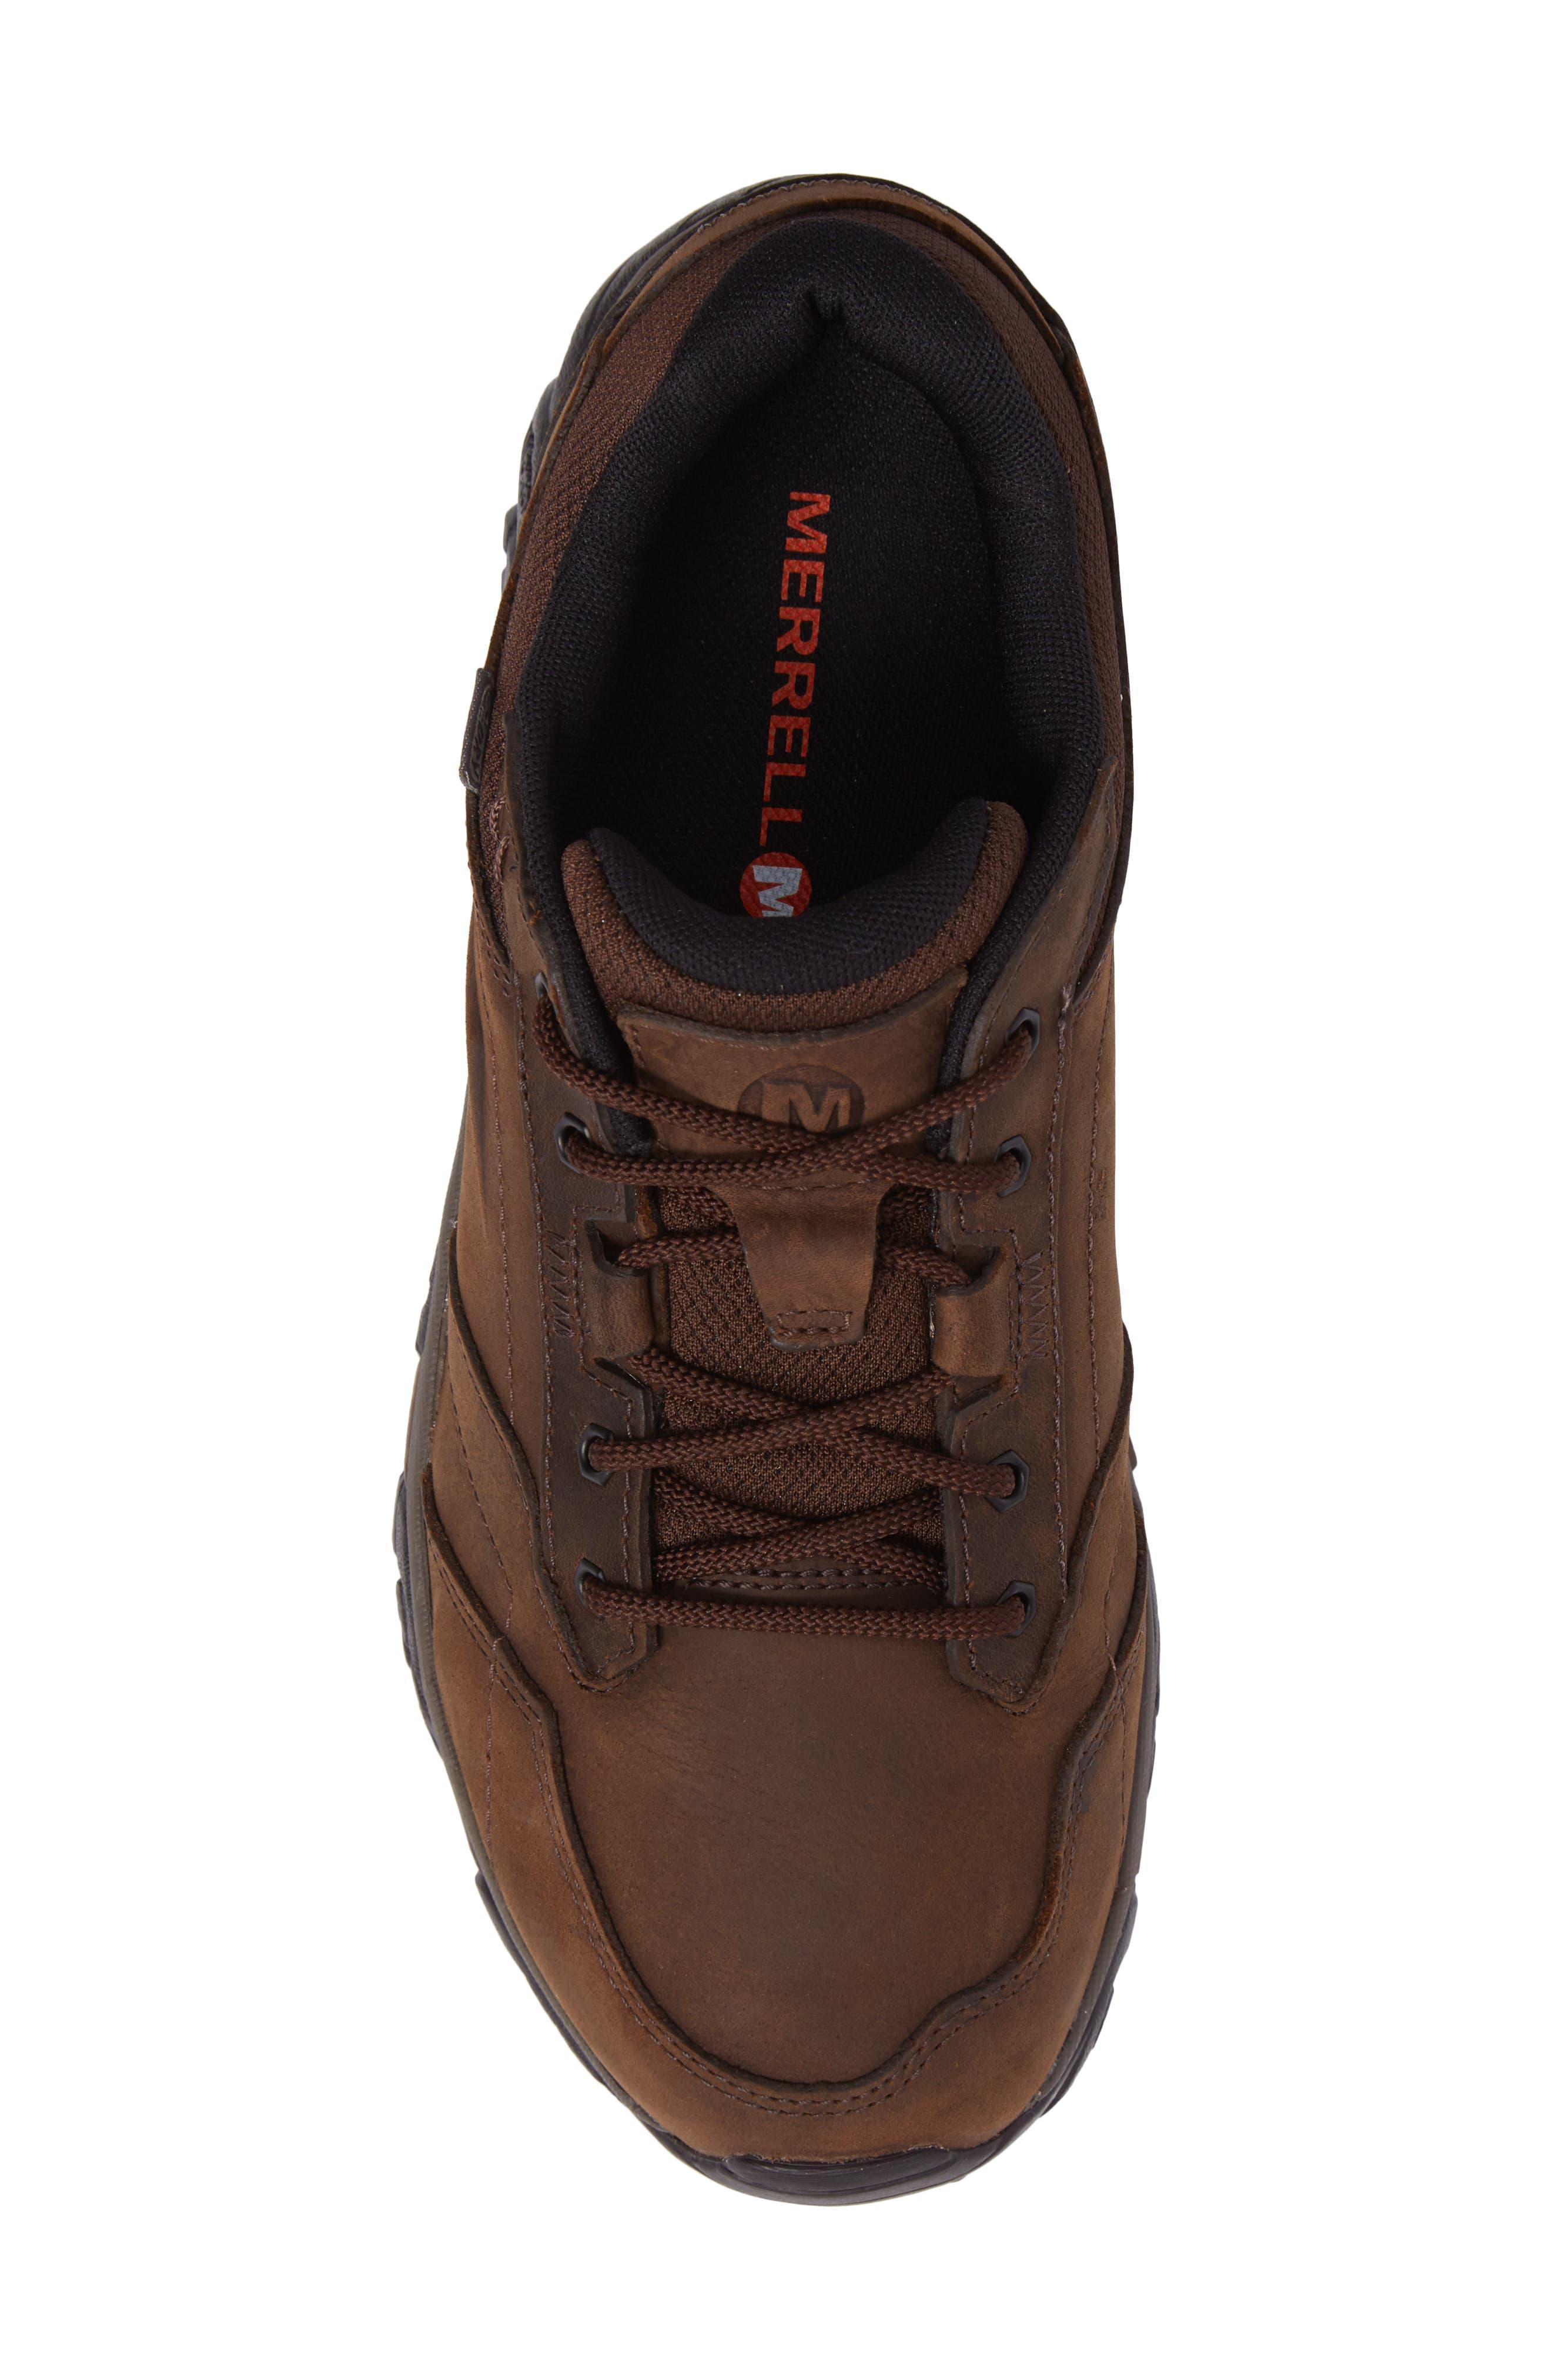 Moab Adventure Hiking Shoe,                             Alternate thumbnail 5, color,                             Dark Earth Nubuck Leather